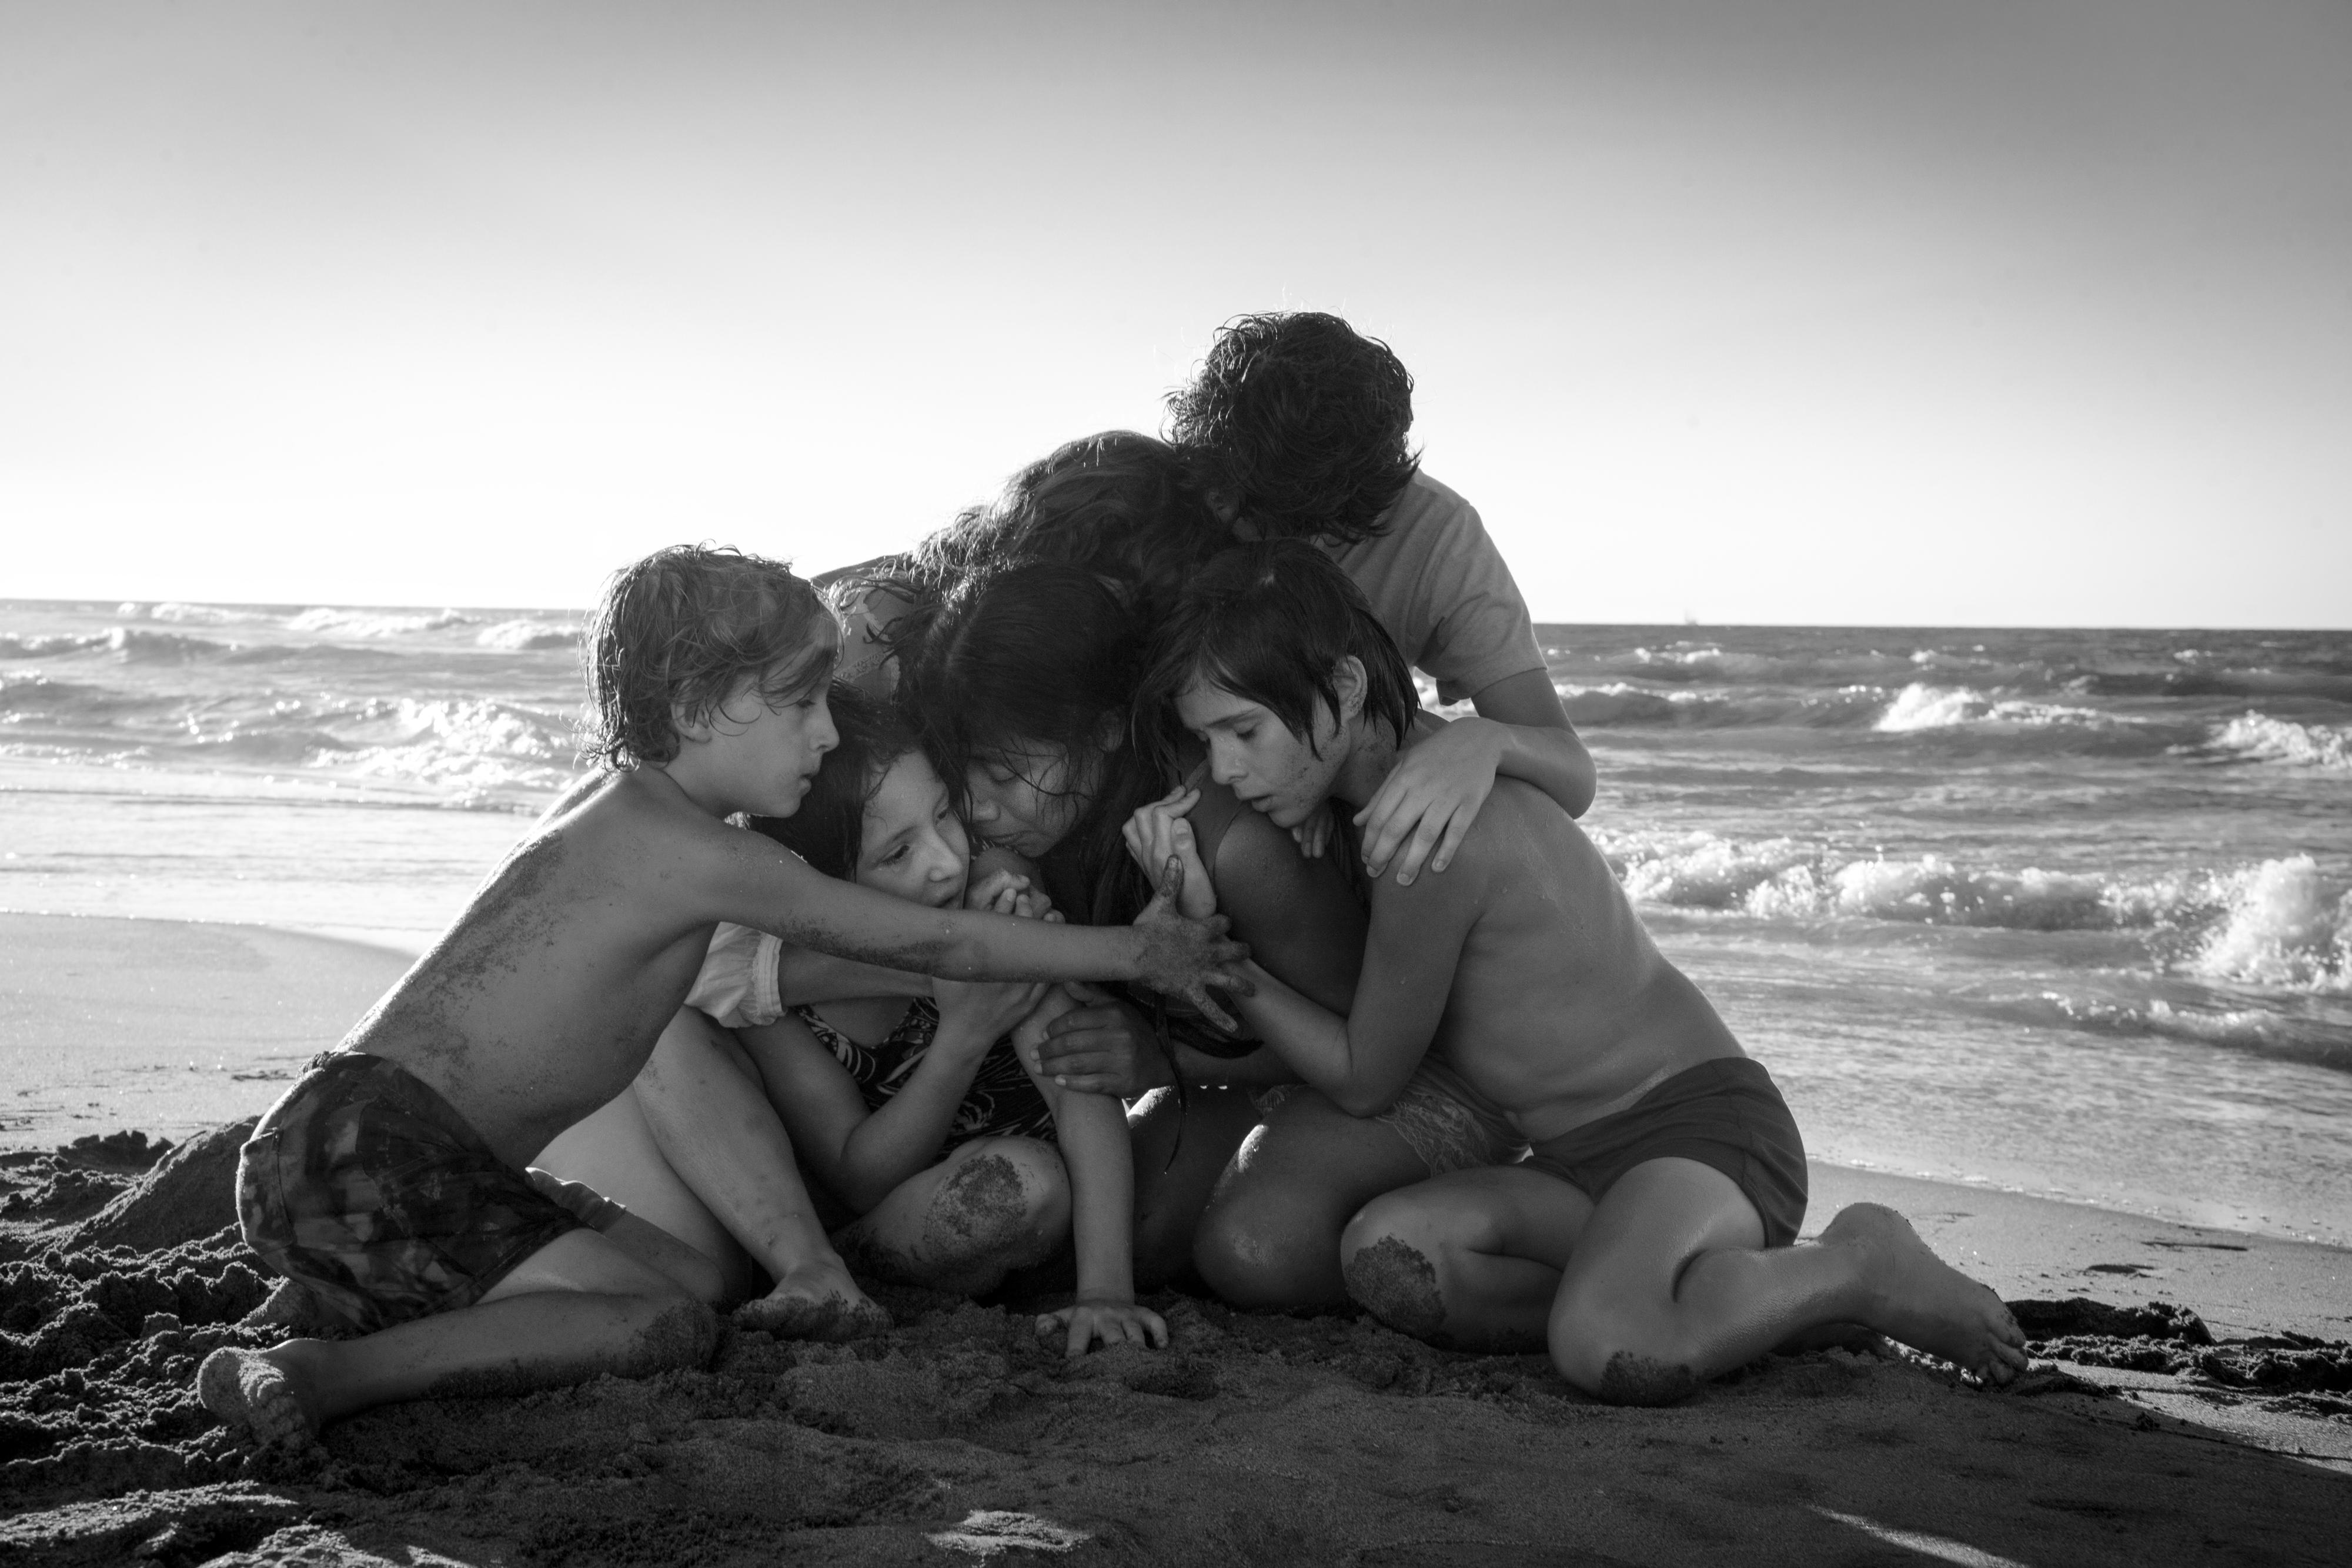 Marco Graf, Daniela Demesa, Yalitza Aparicio, Marina De Tavira, Diego Cortina Autrey, and Carlos Peralta Jacobson in Roma, written and directed by Alfonso Cuarón.